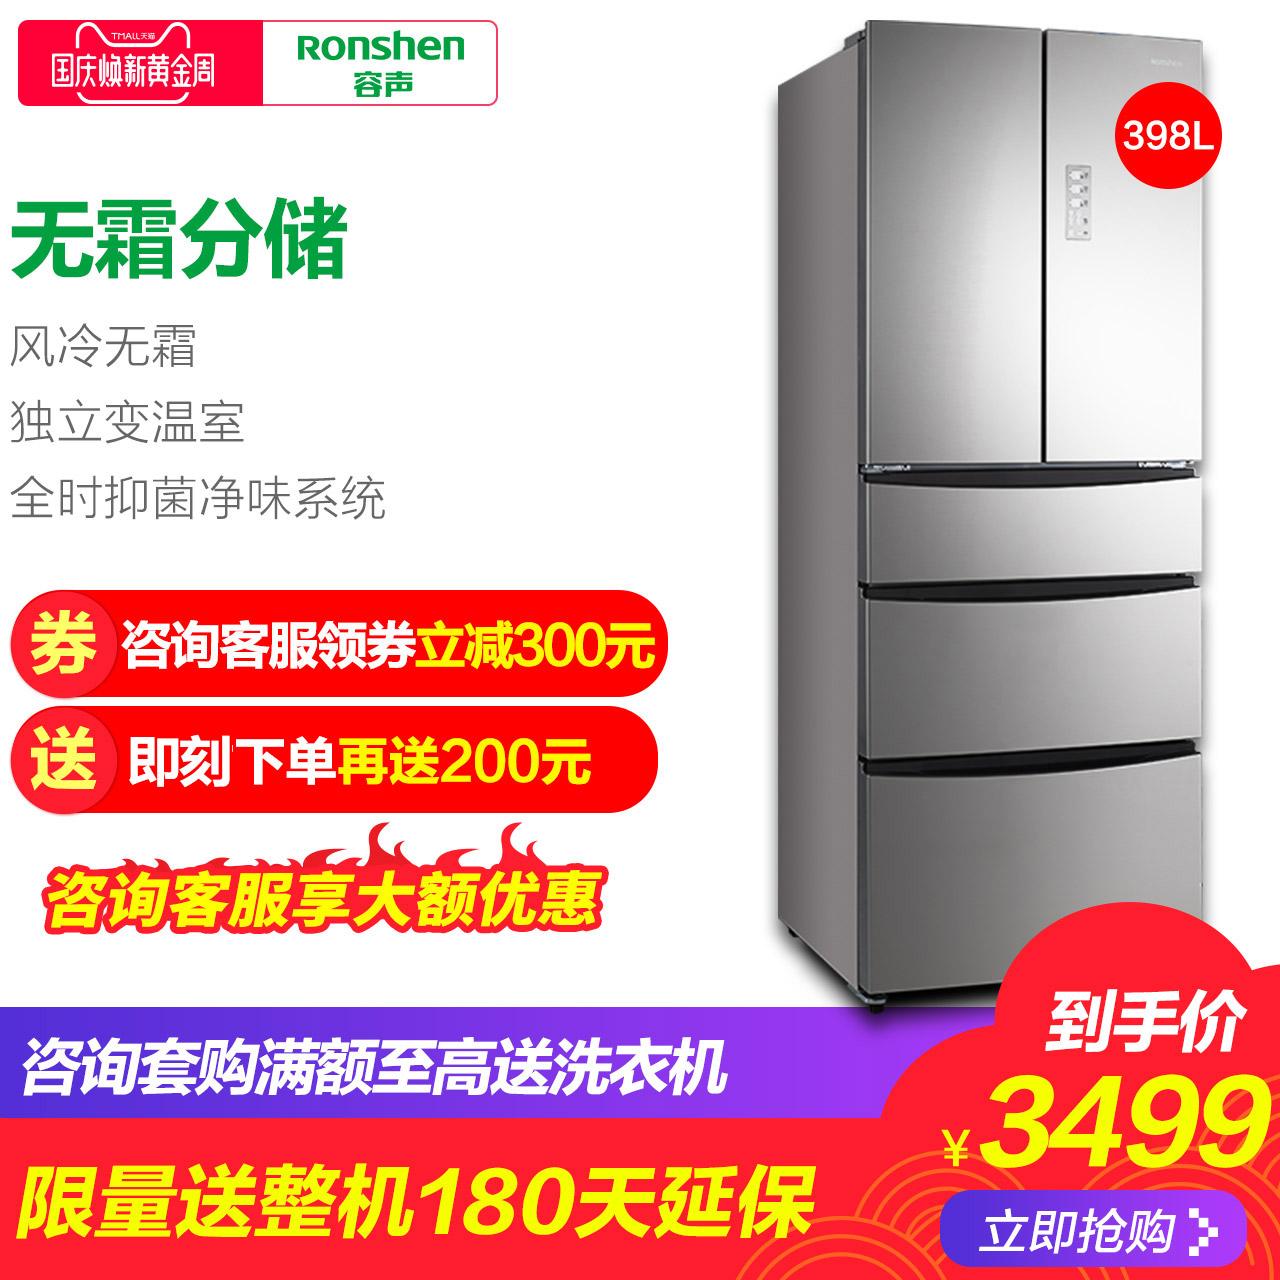 Ronshen-容声 BCD-398WD11MY 多门对开门家用电冰箱风冷大容量